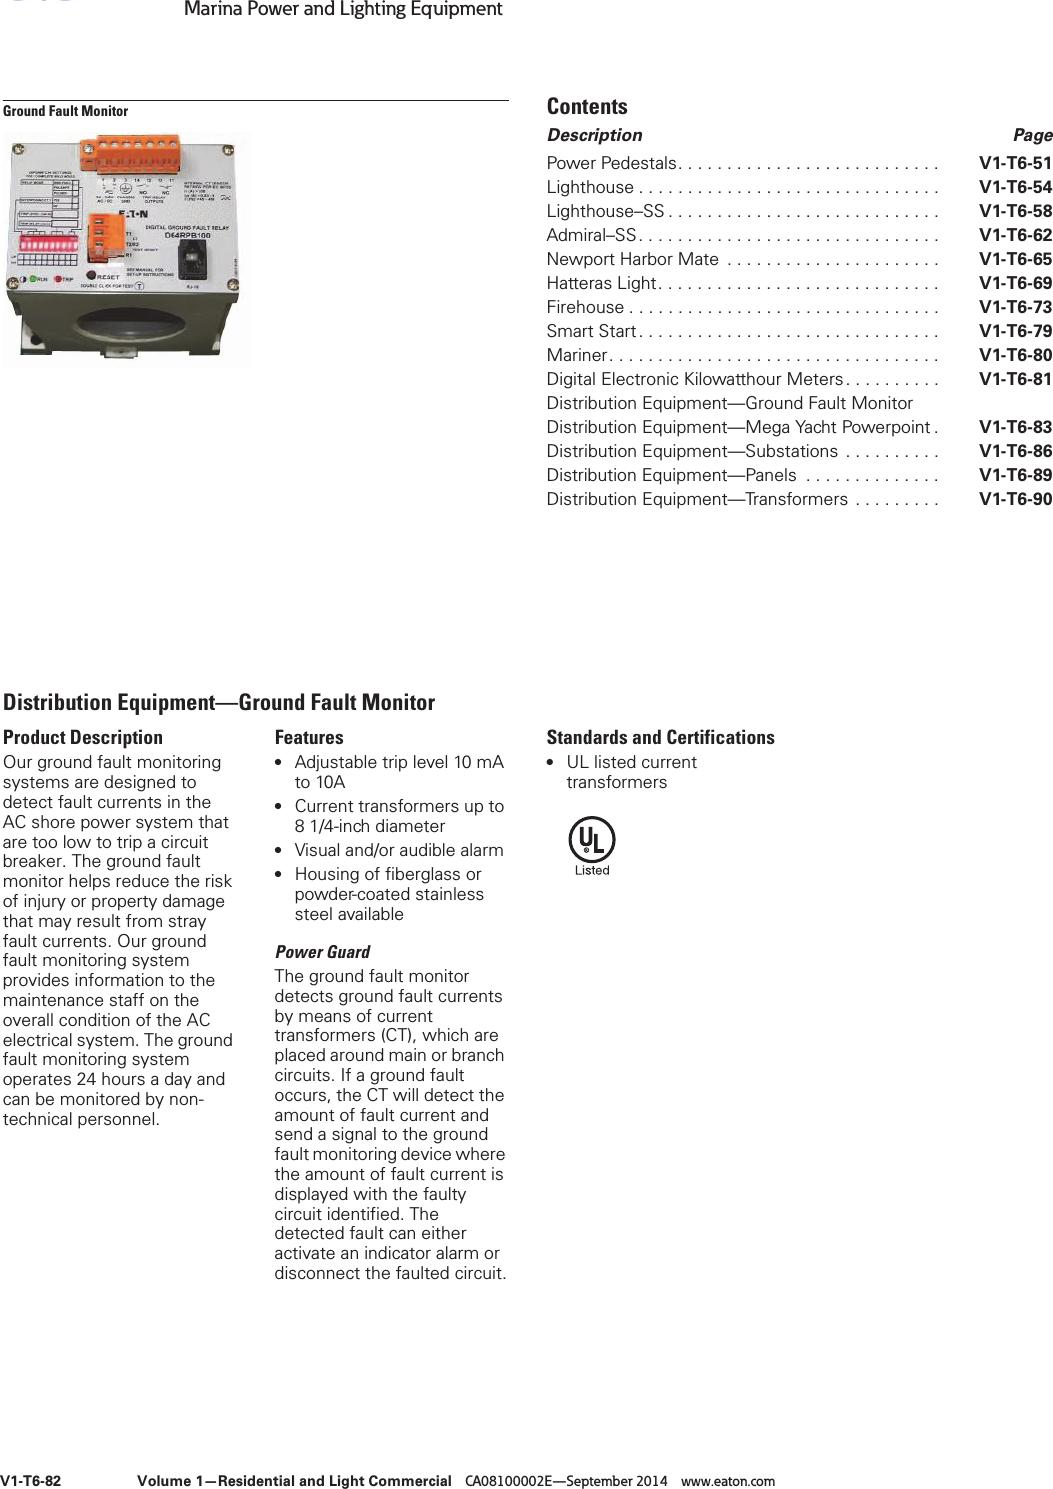 Volume 01—Residential And Light Commercial 226188 Catalog